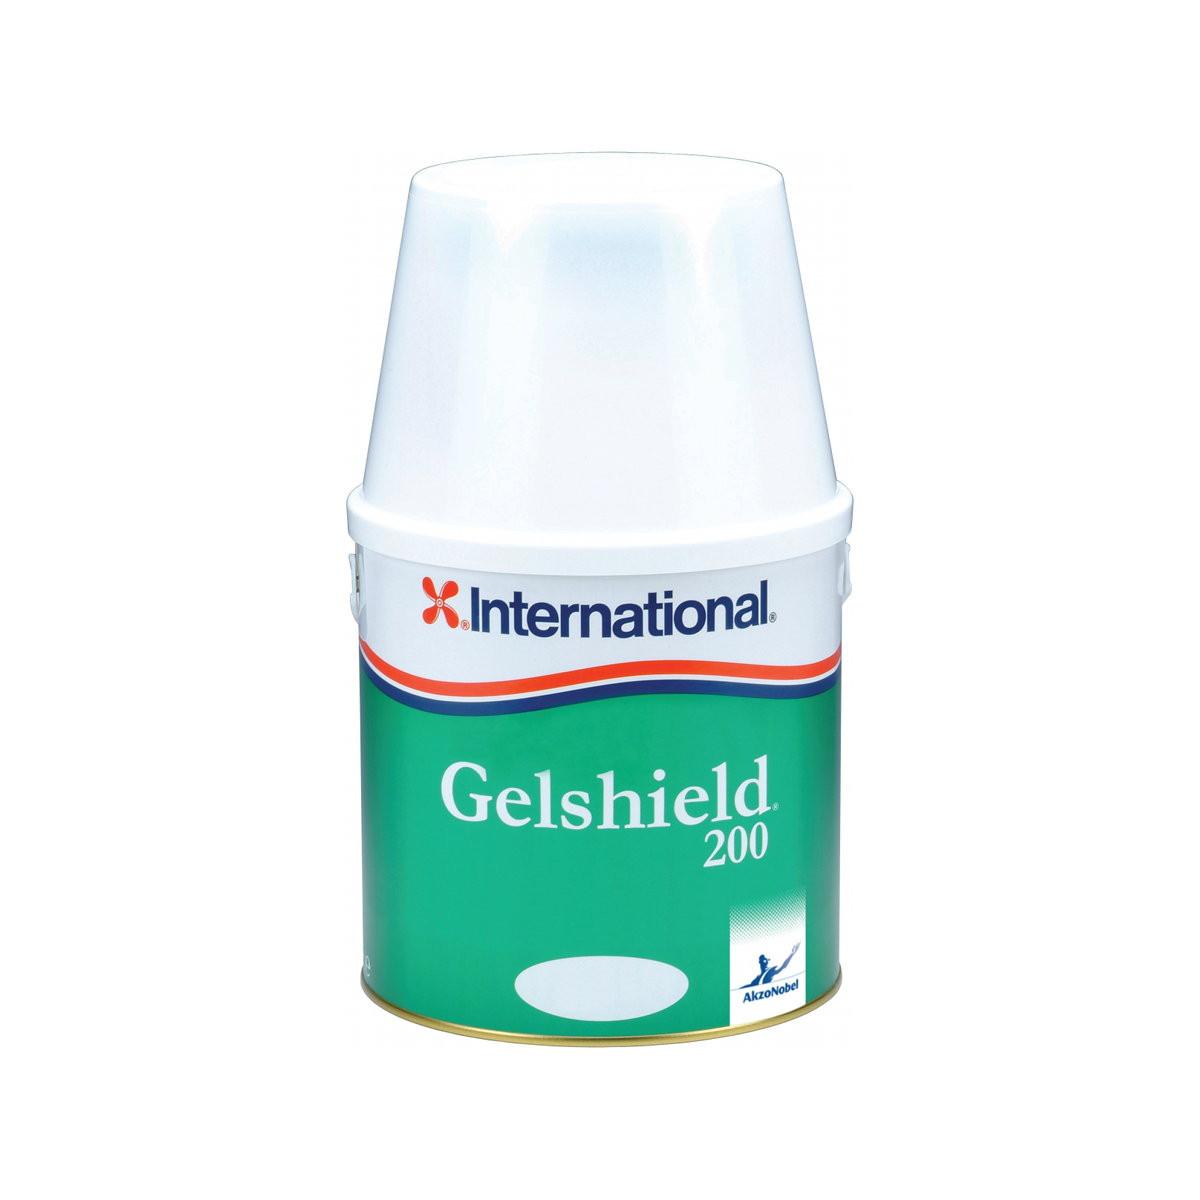 International Gelshield 200 primer - grijs 2500ml